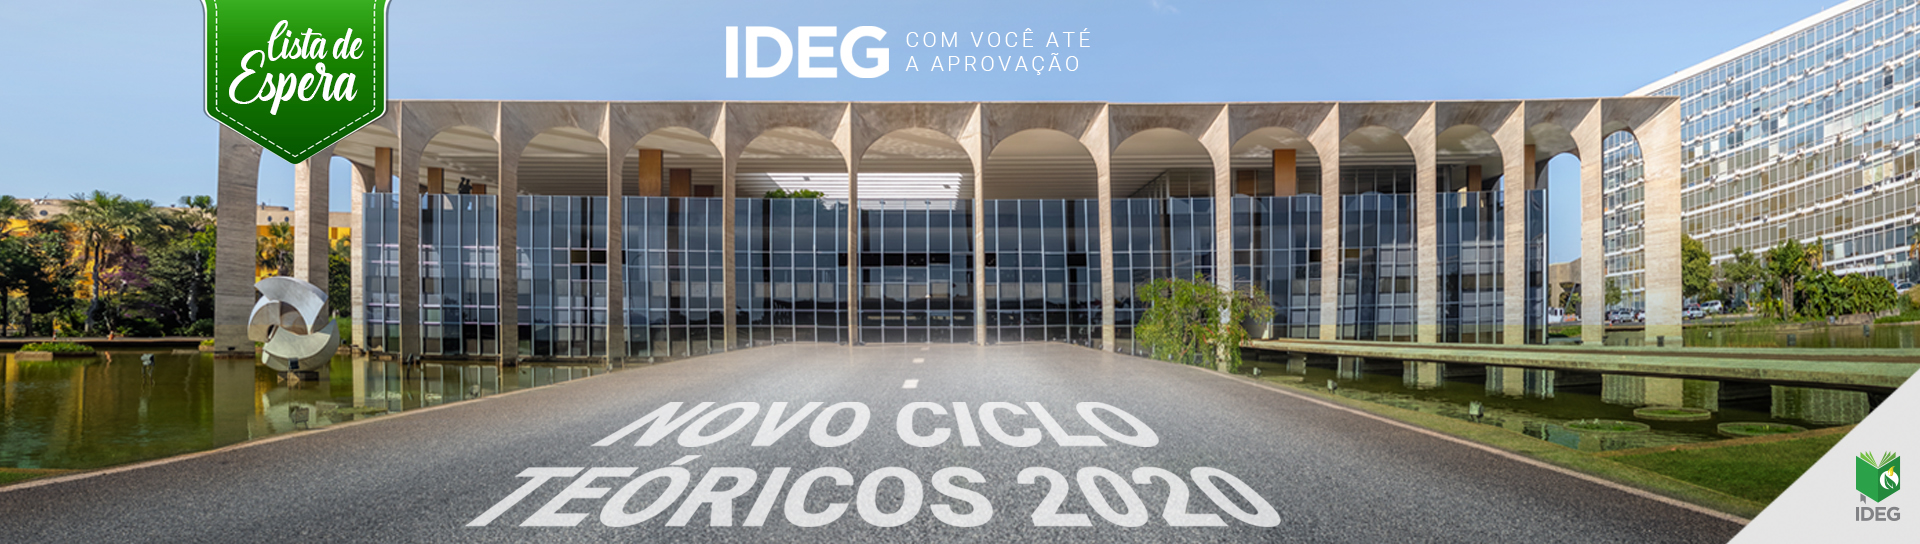 CACD 2020 - cursos teóricos ideg